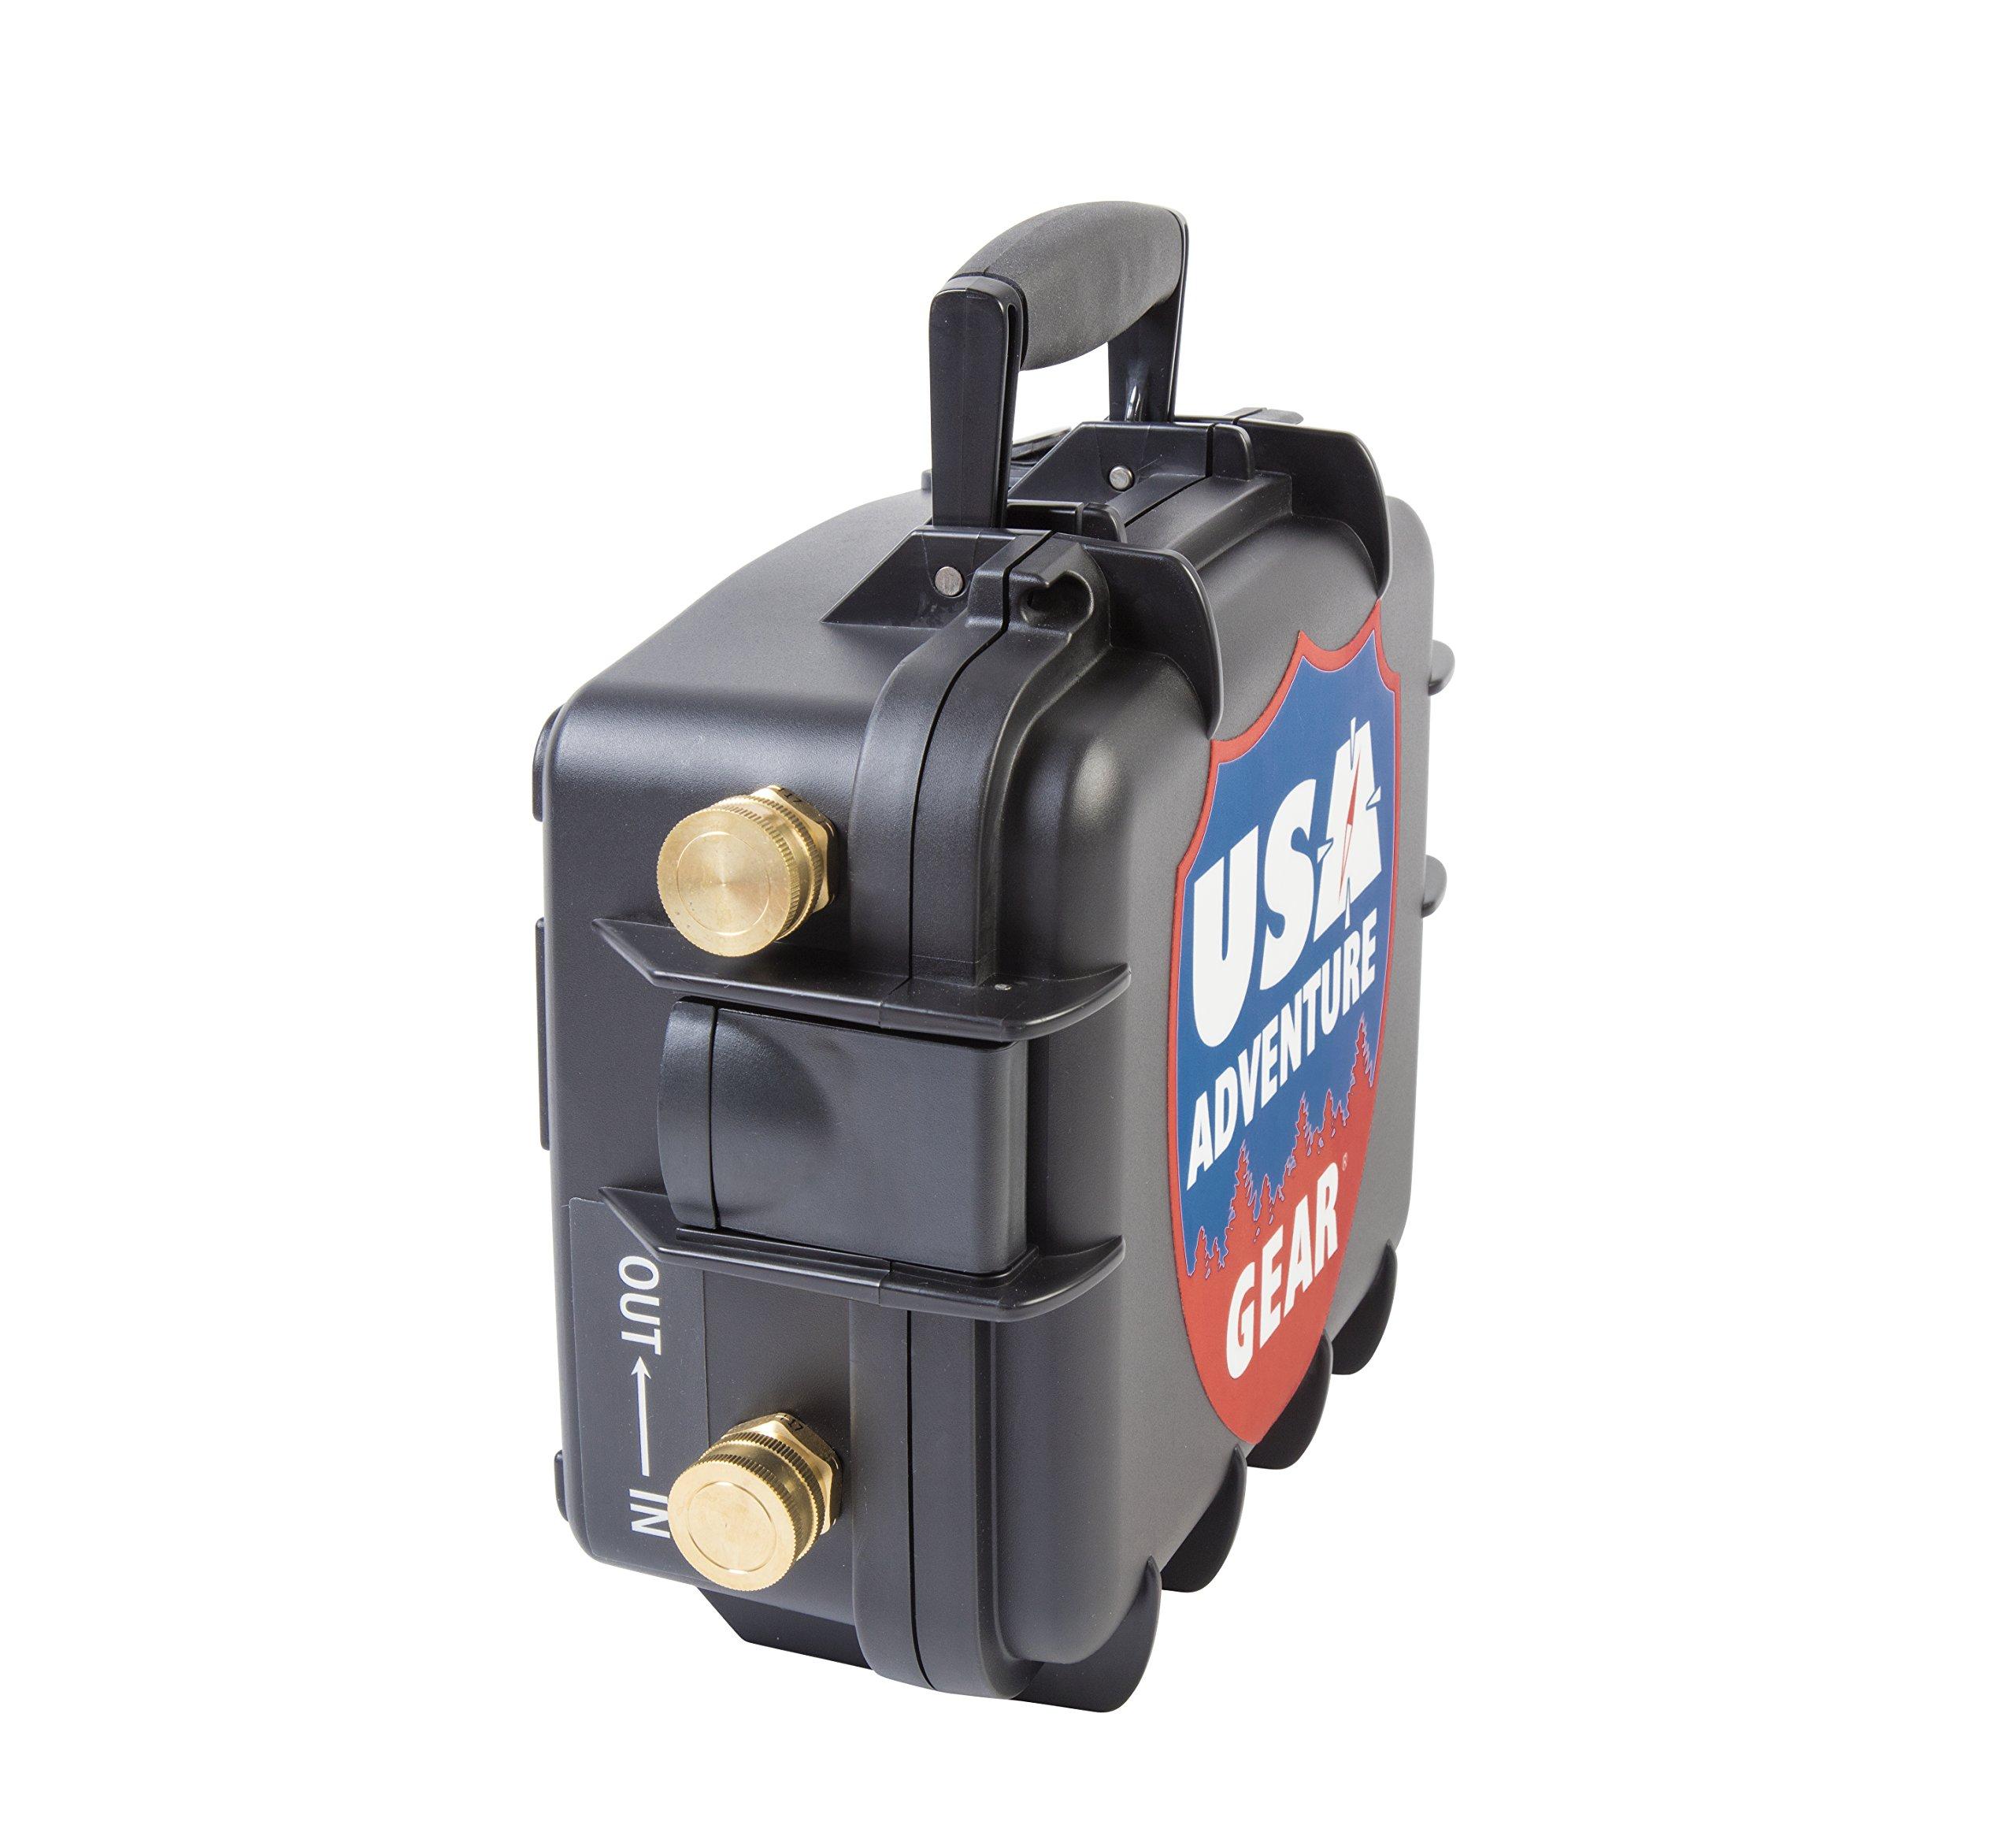 Glacier XE 12v Portable Water Pump featuring USA's 5300 ProGear Professional Grade Pump by USA Adventure Gear (Image #2)